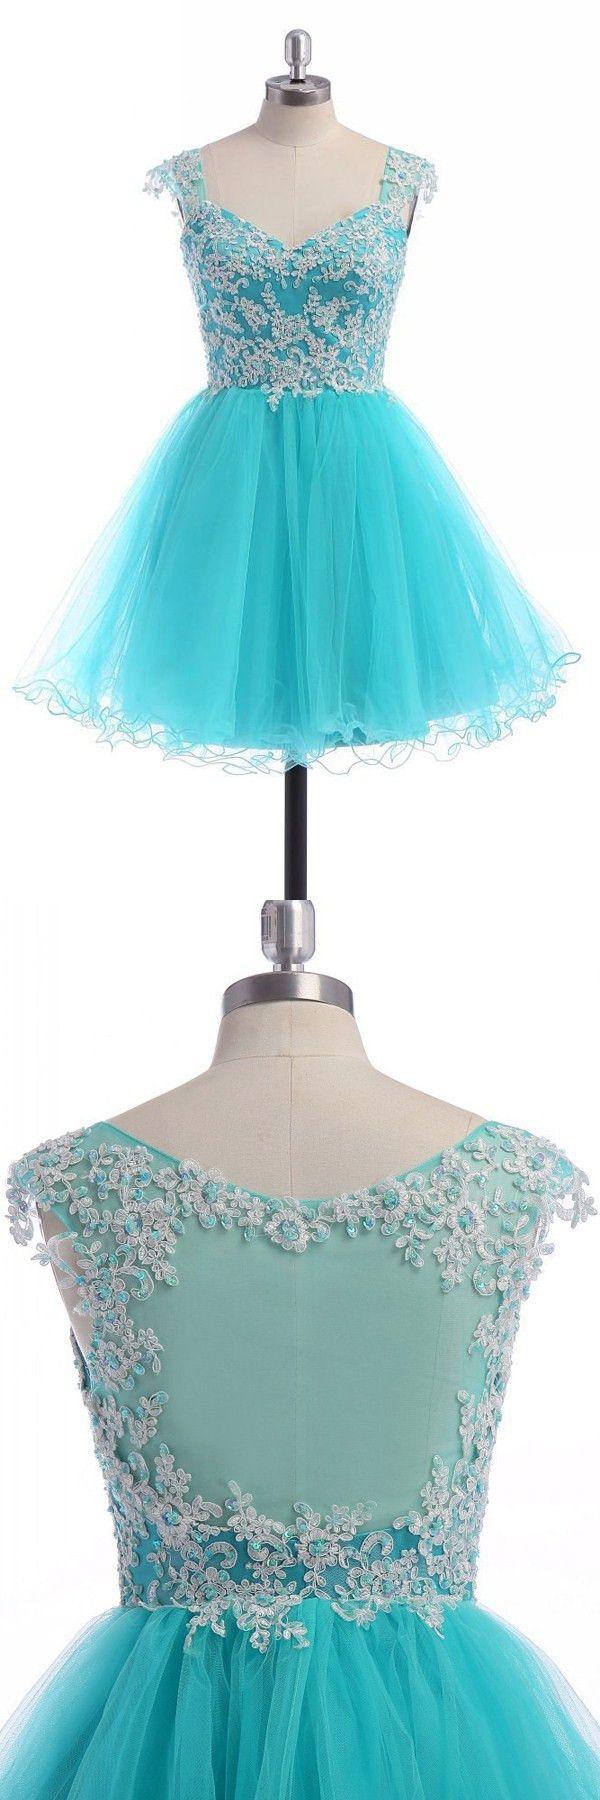 2016 homecoming dresses,homecoming dresses,cheap short prom dresses,blue illusion back hoco dresses,cheap lace short prom dresses